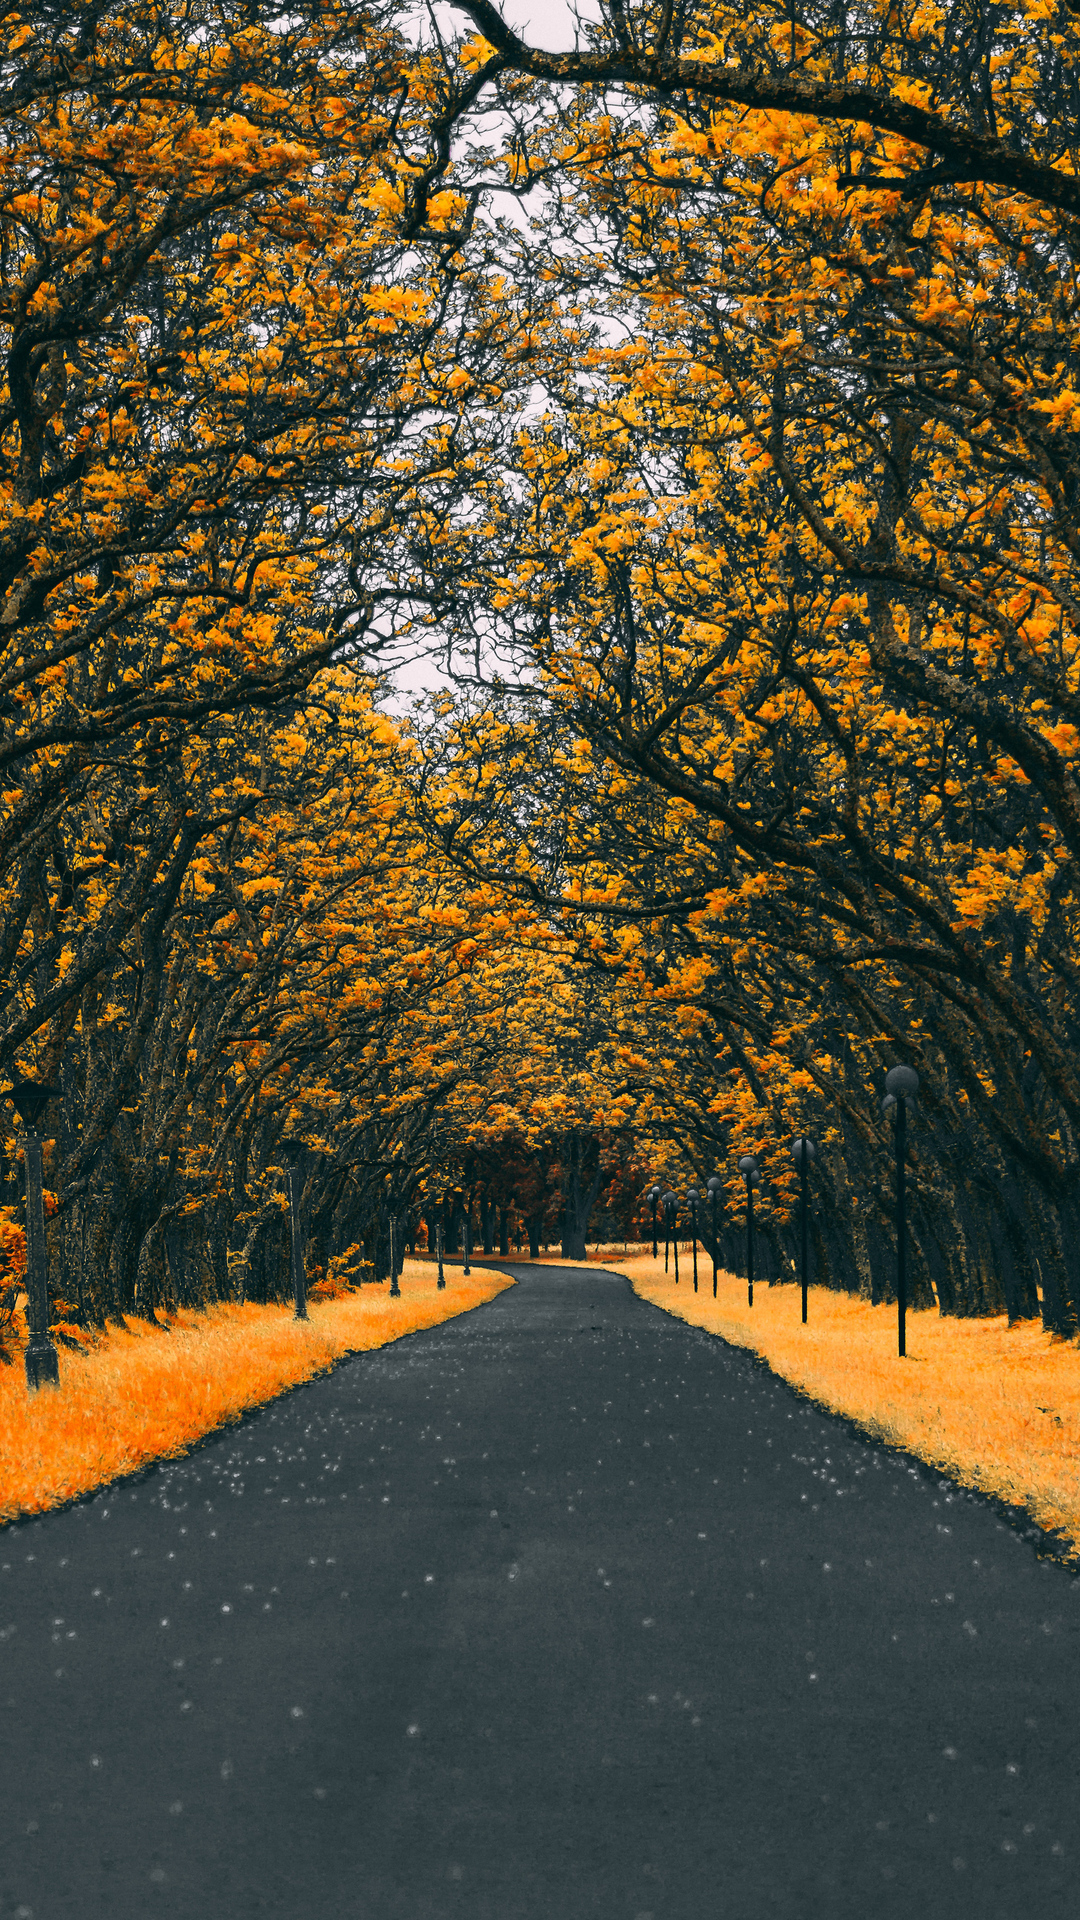 Autumn Road Nature 4k Wallpaper Orange And Dark Grey Color Palette 2934322 Hd Wallpaper Backgrounds Download